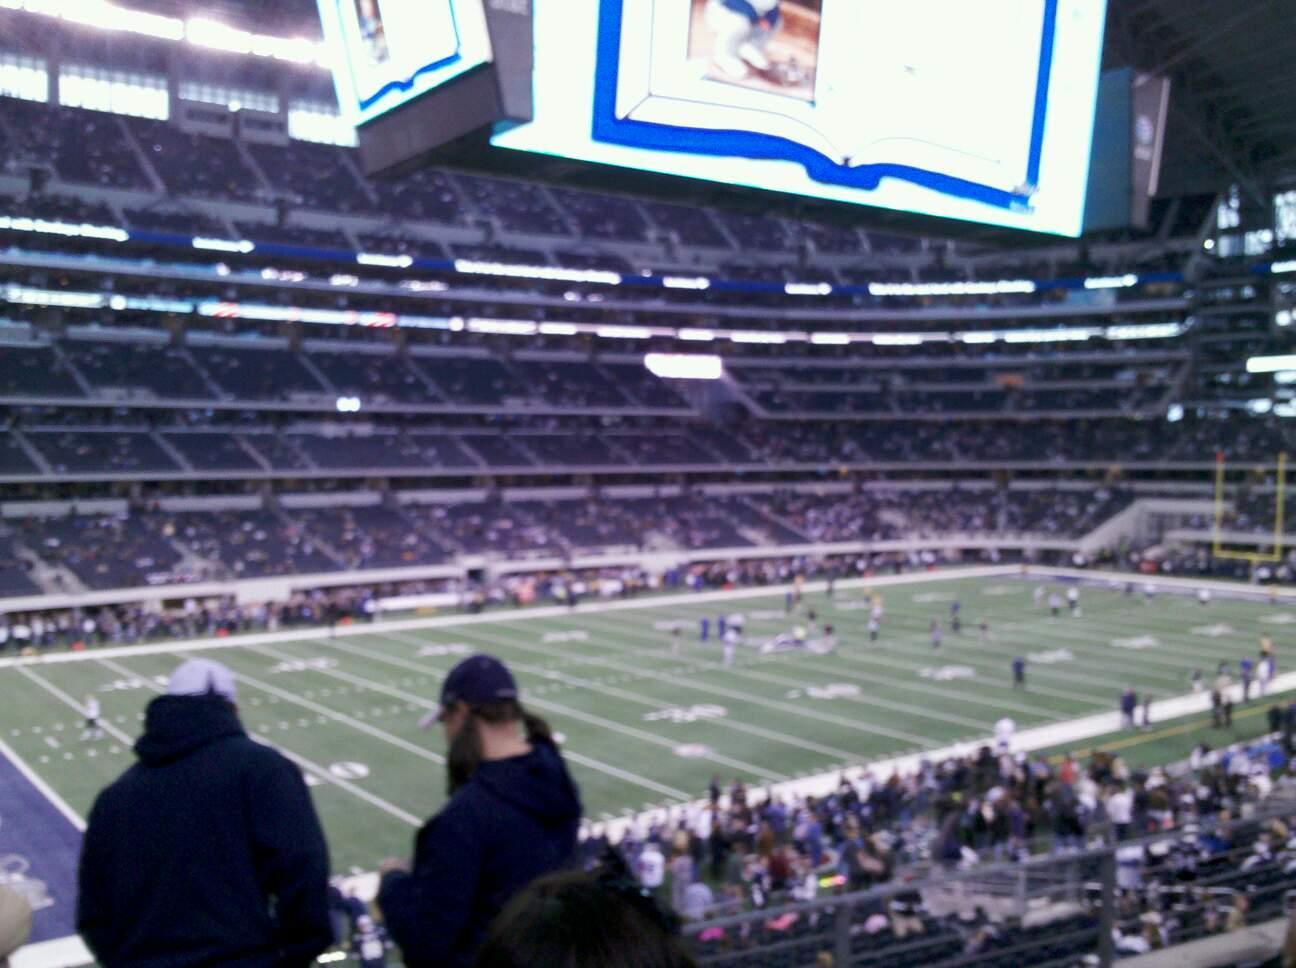 AT&T Stadium Section C238 Row 13 Seat 1